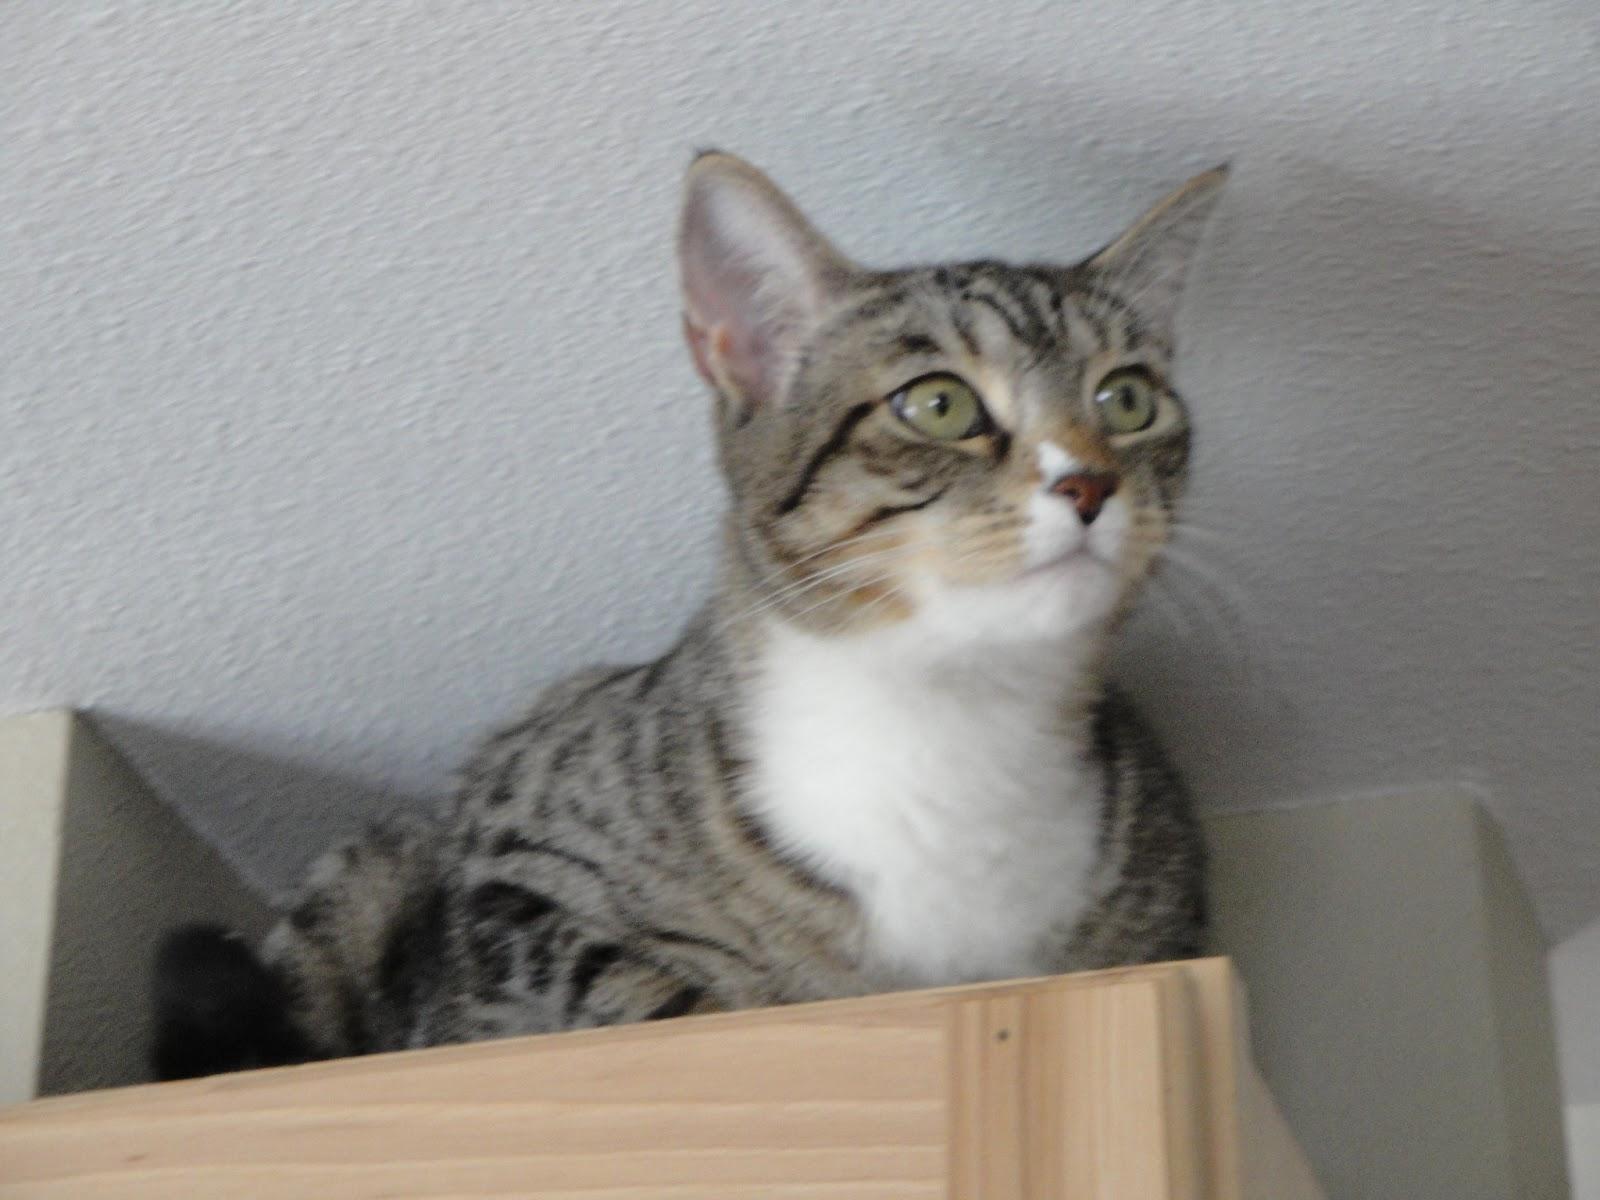 Pussy cat photo